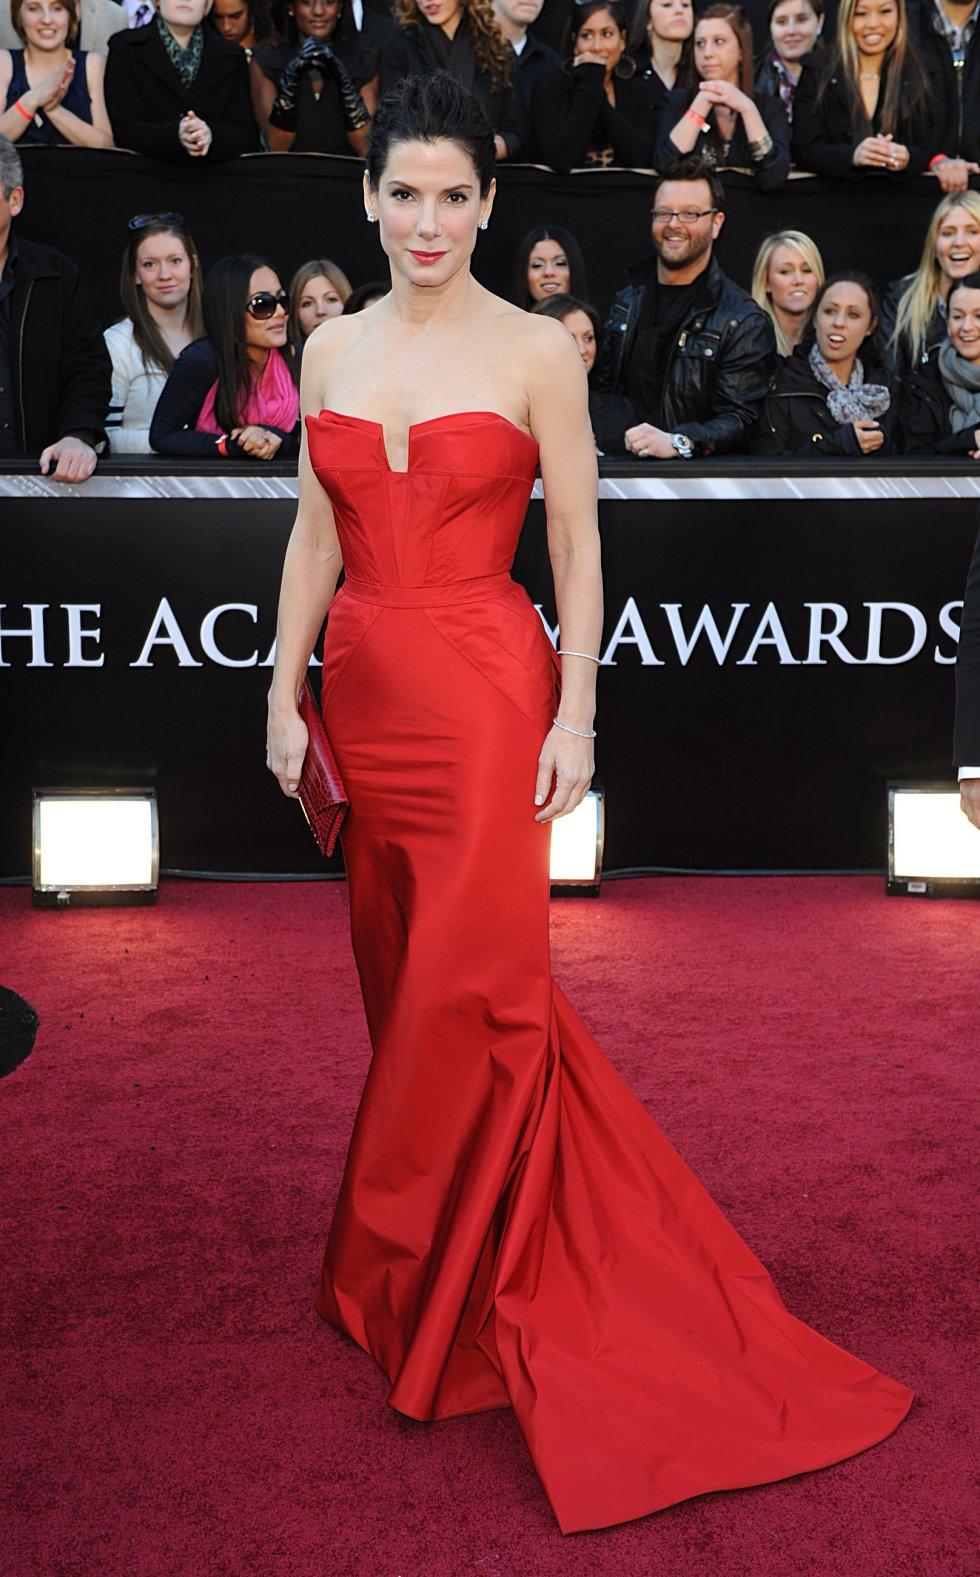 Sandra Bullock, en la alfombra roja de 2011, con un diseño rojo de Vera Wang.